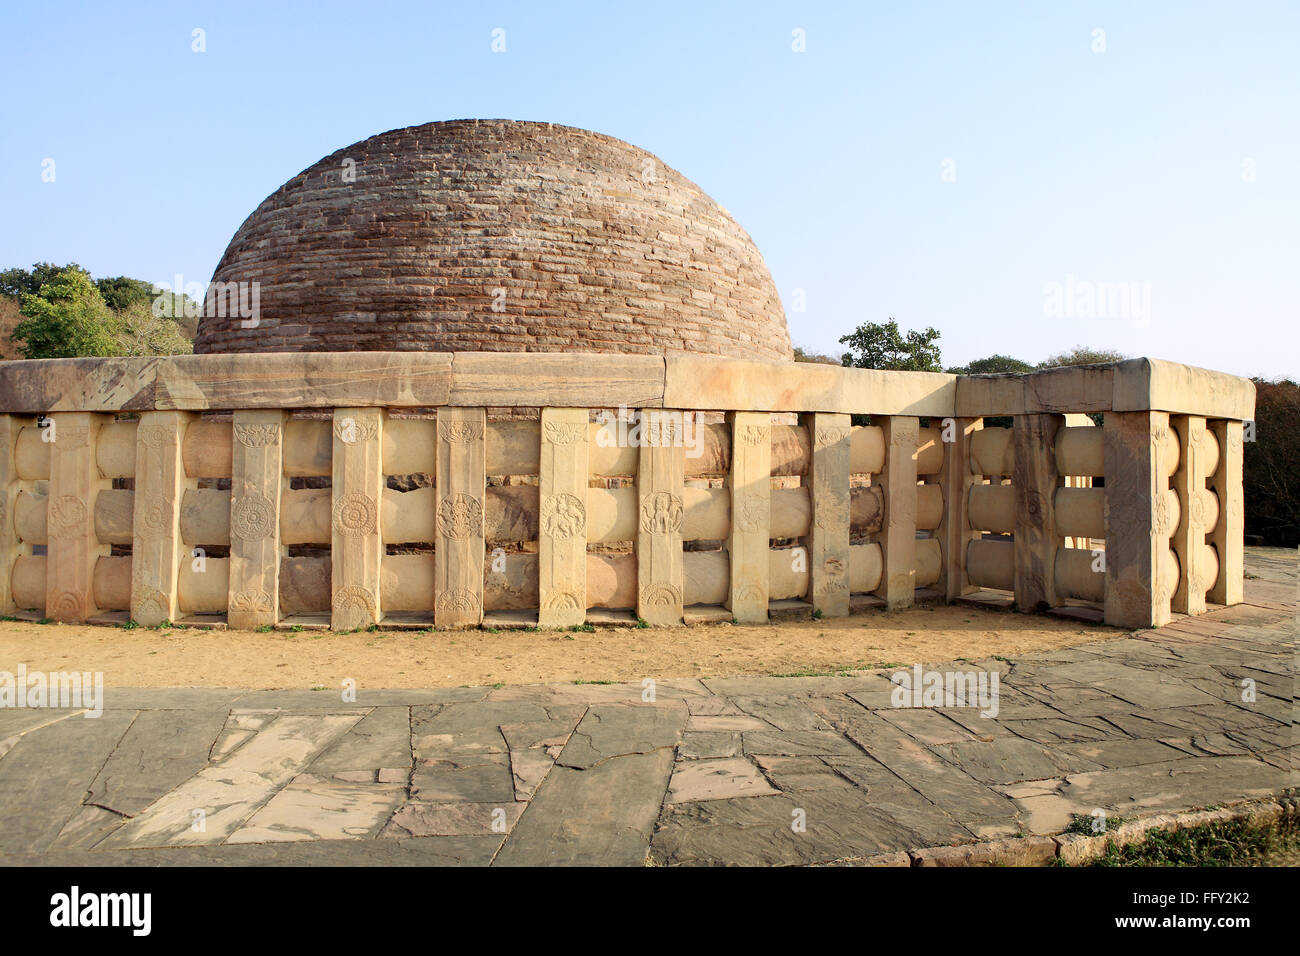 Stupa 2 built by sunga in 2nd century BC representations of Buddha executed railing pillars stupa Sanchi Bhopal - Stock Image